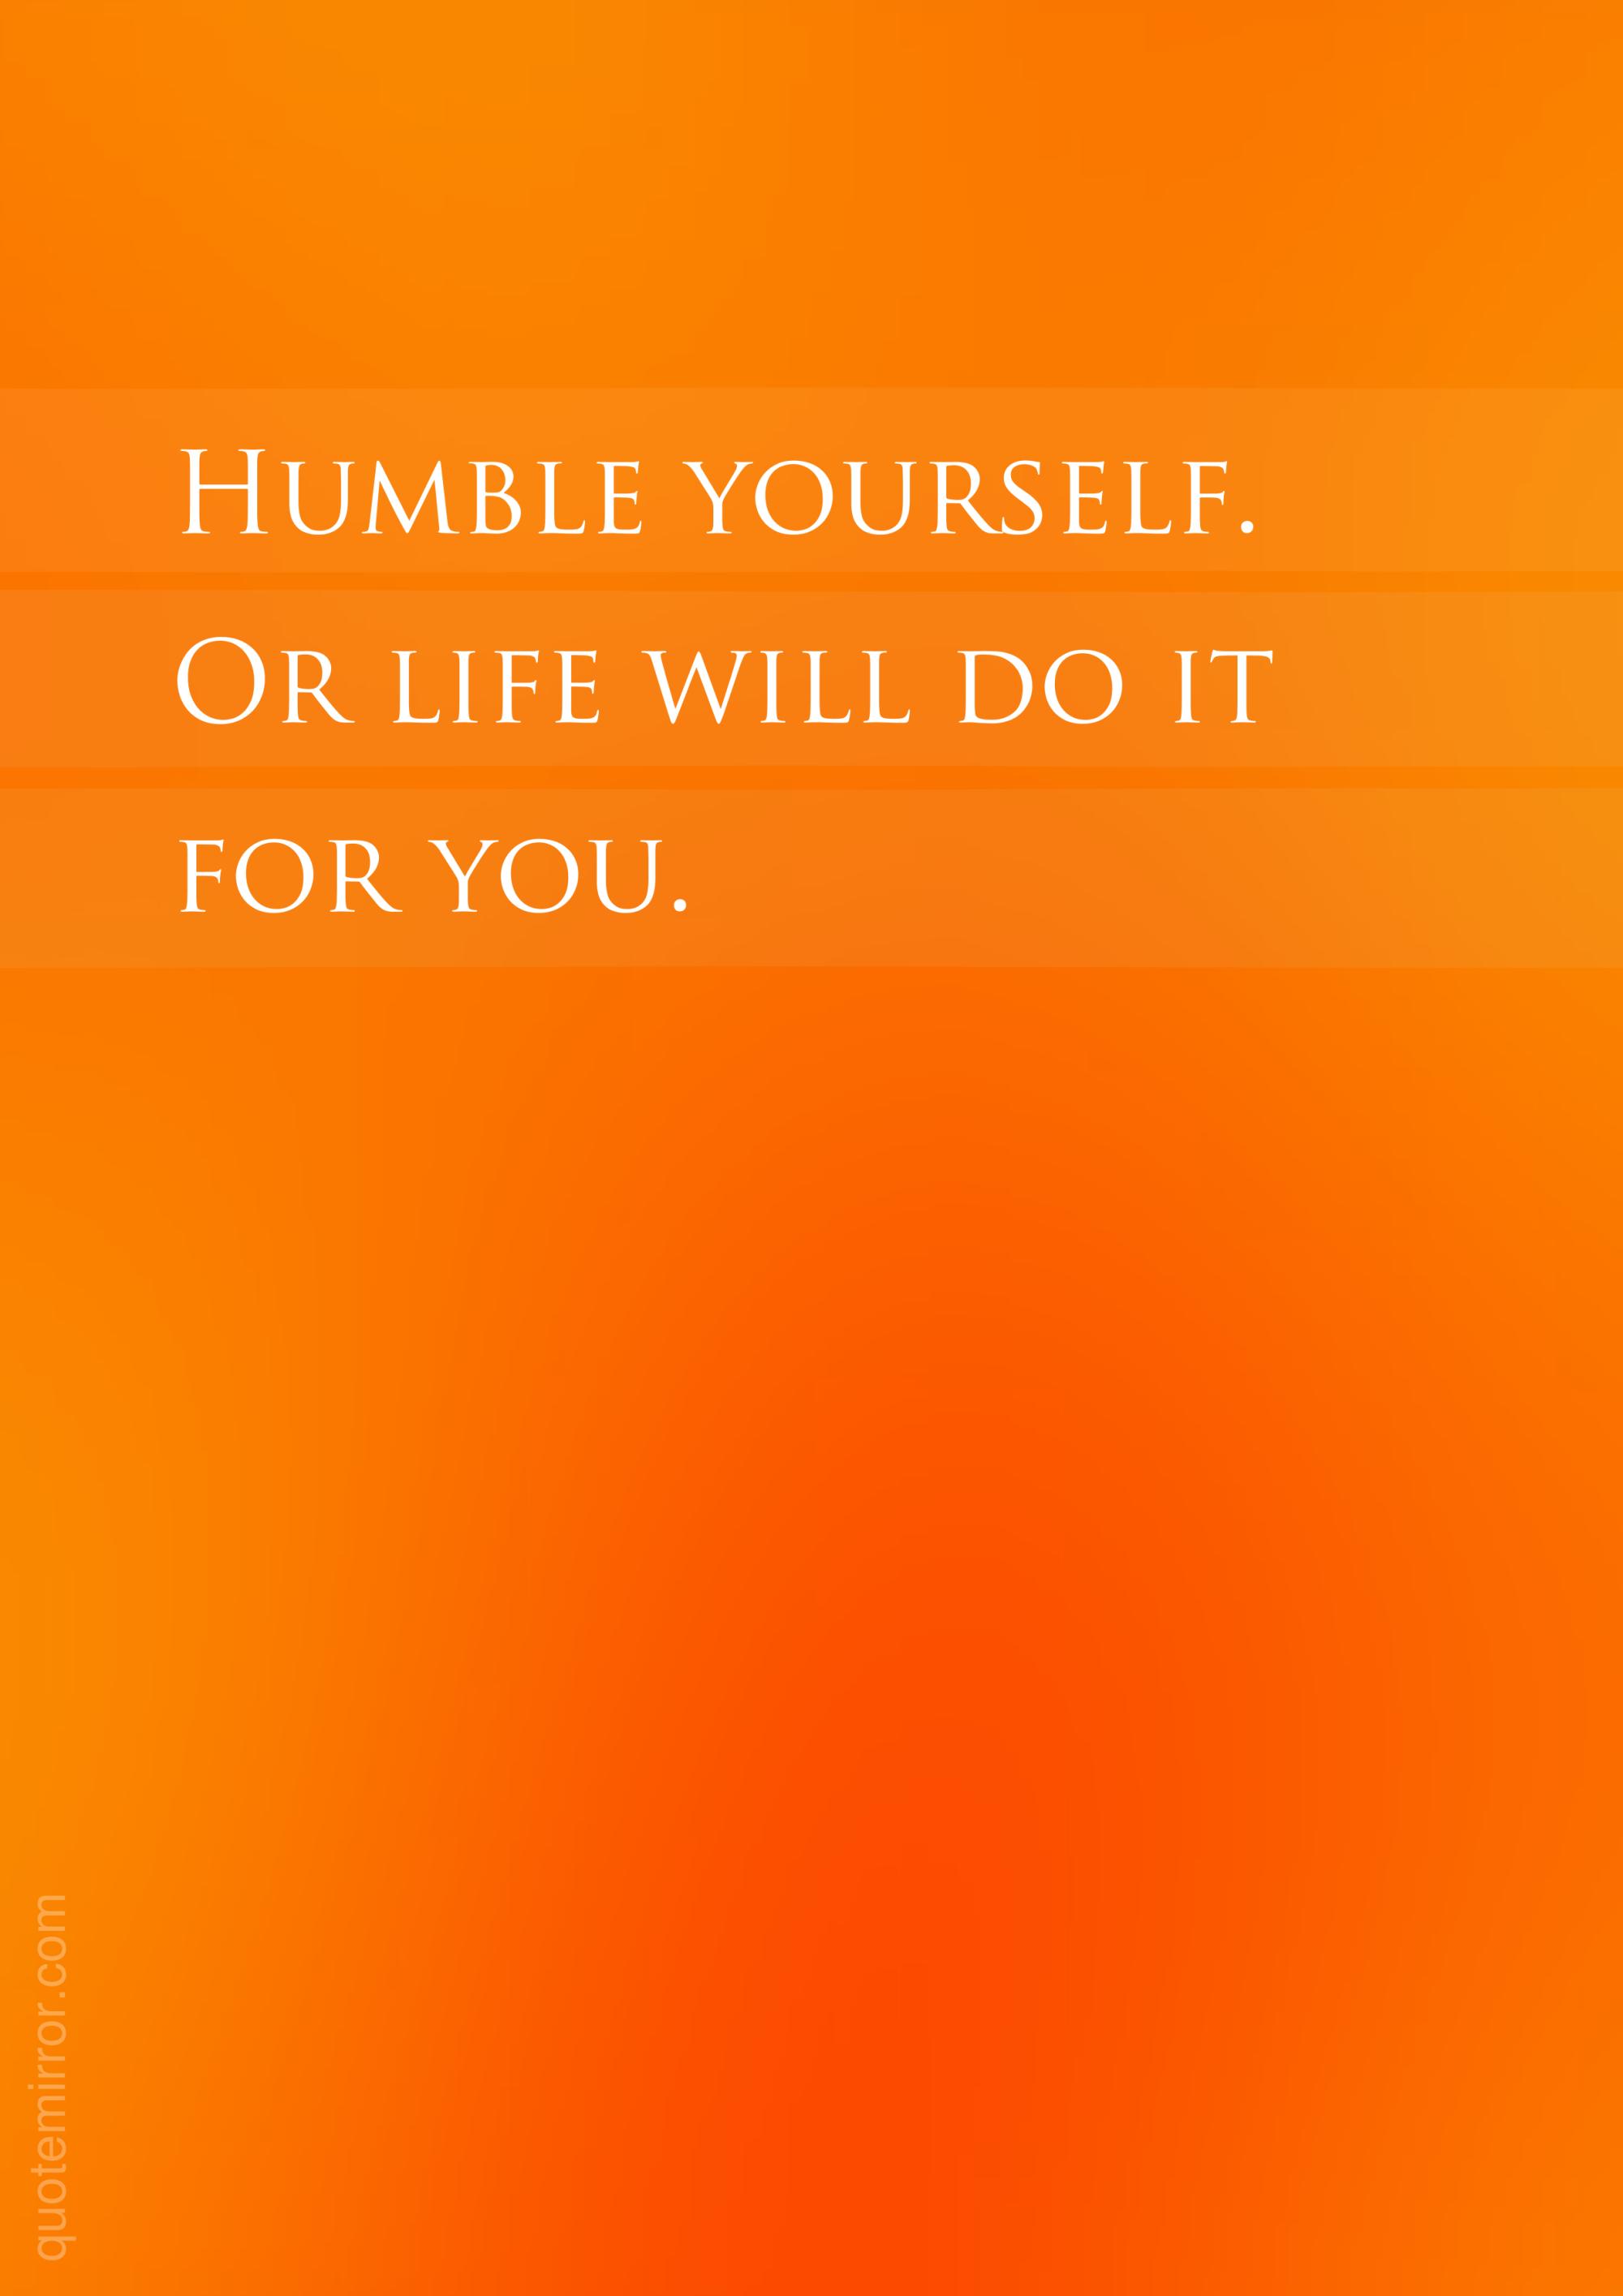 Humble yourself | quotes | Humble yourself, Humble quotes, Be